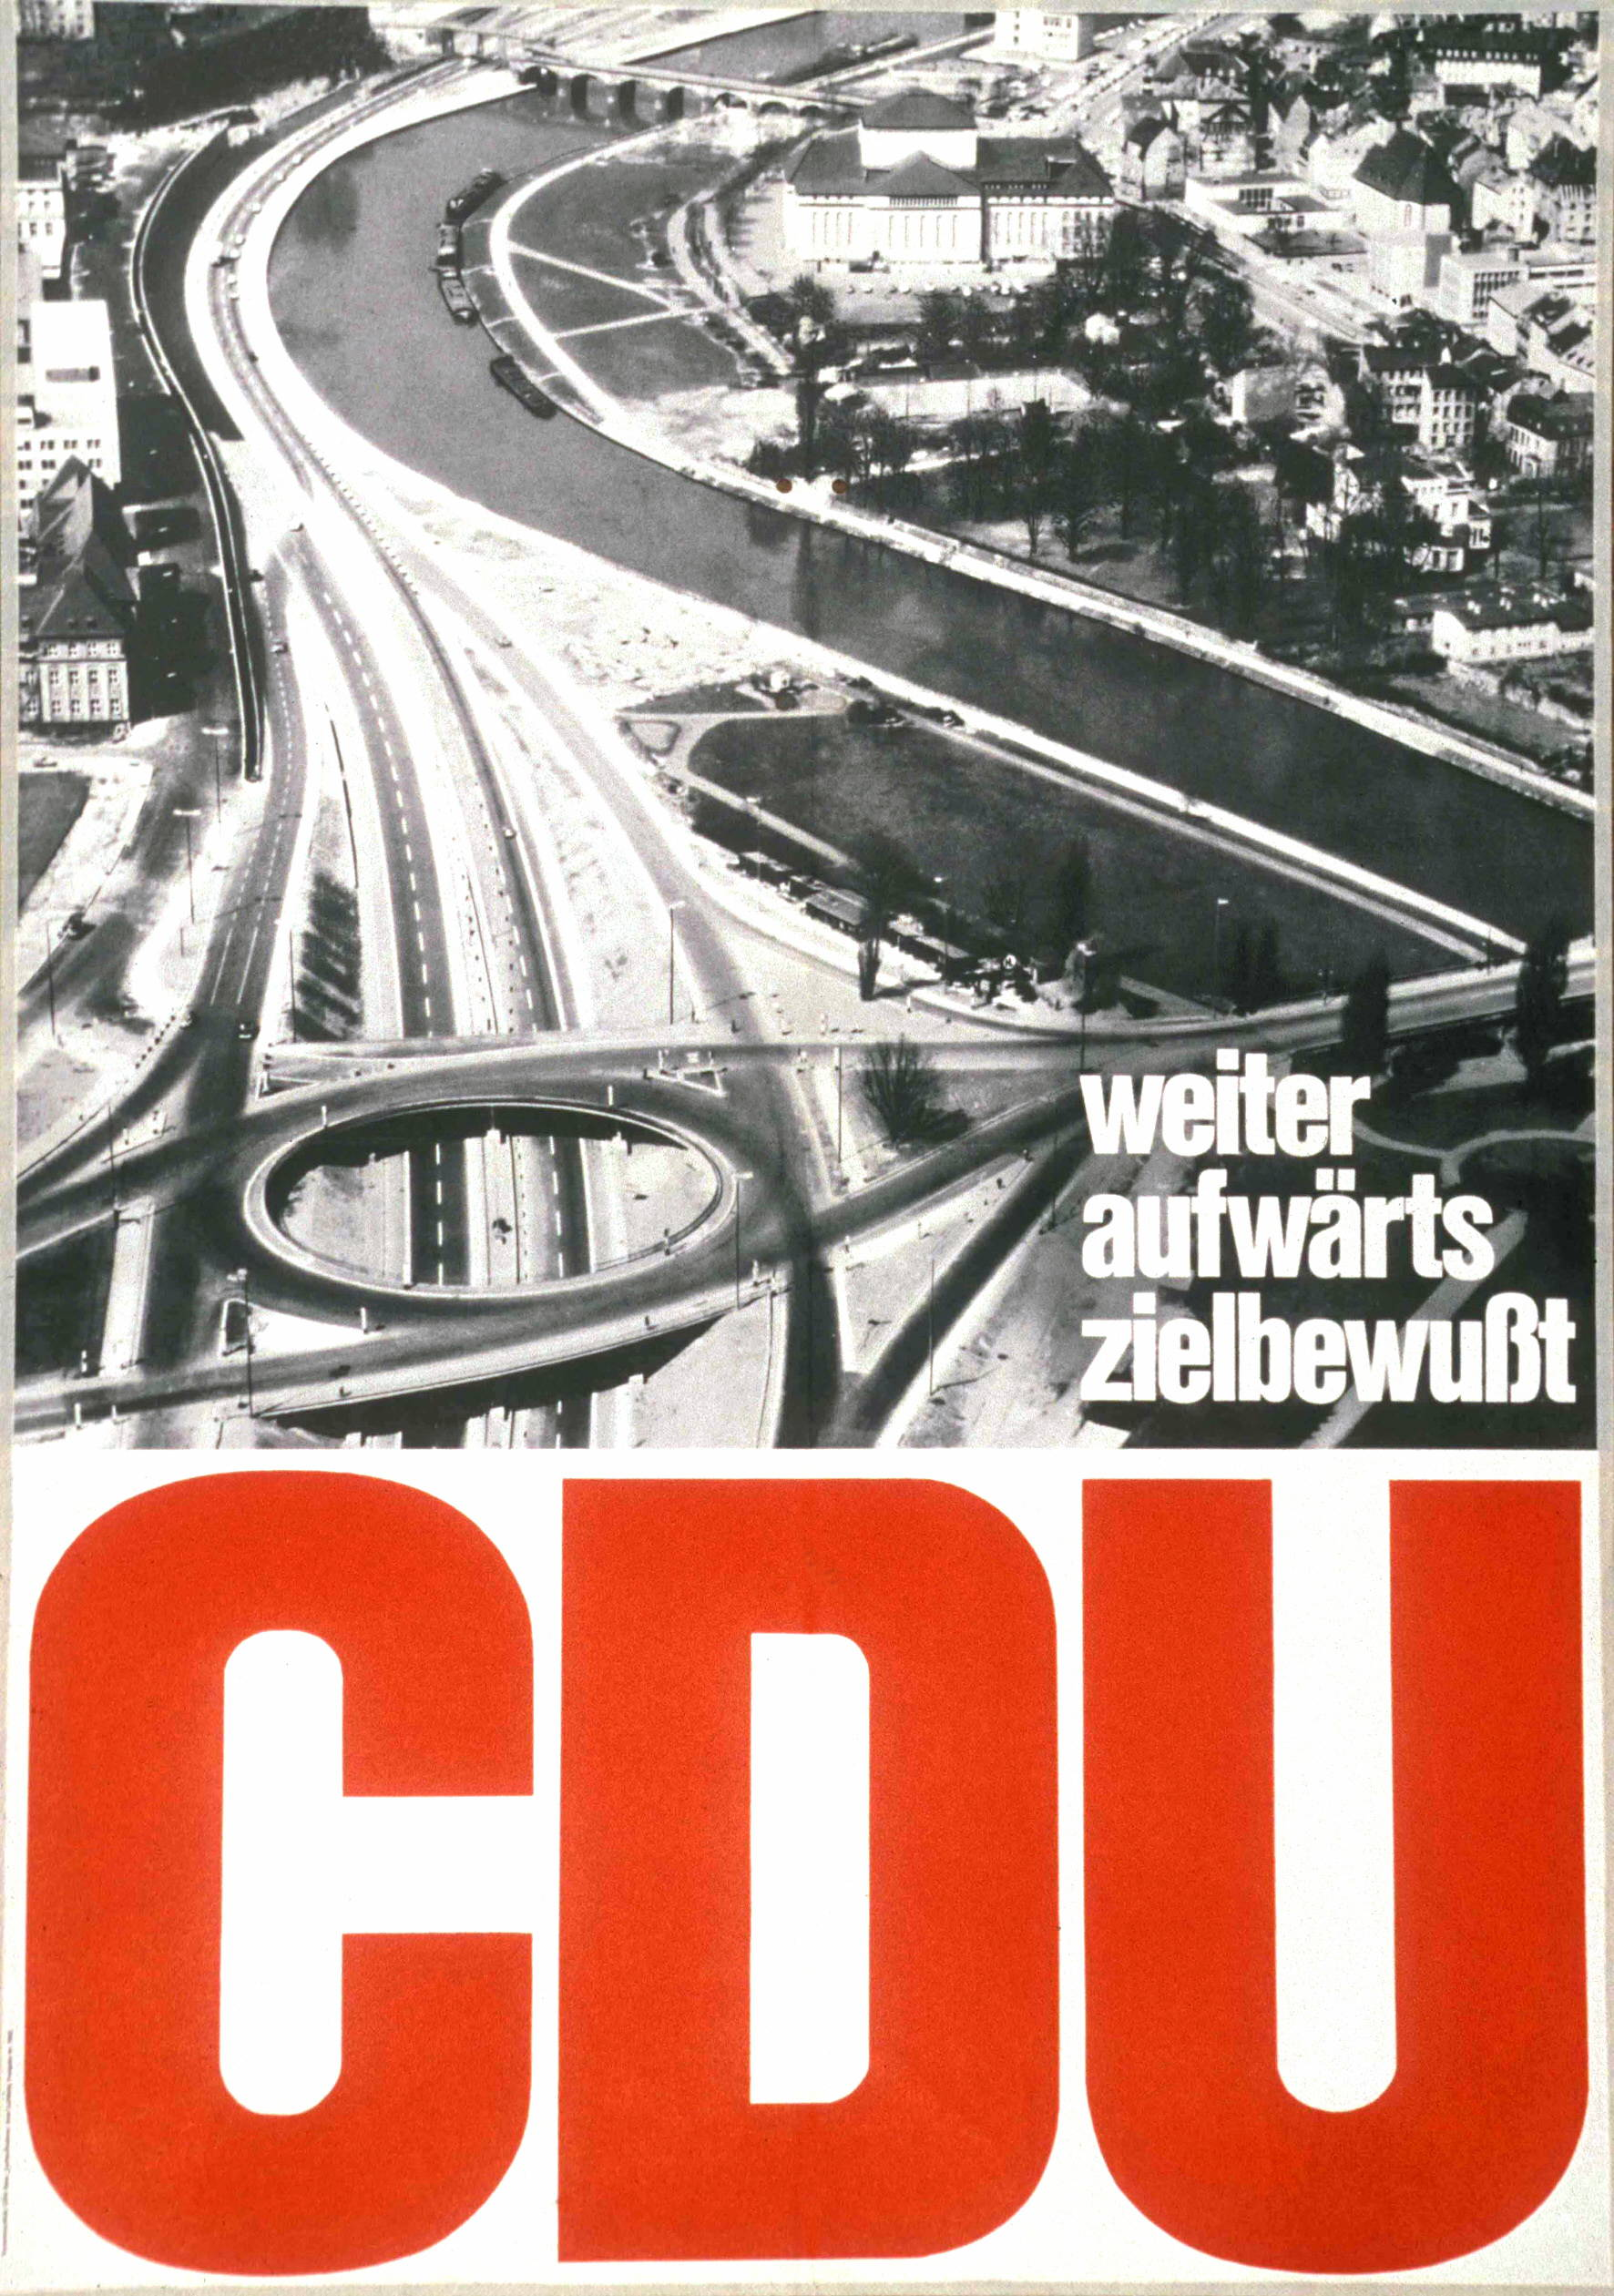 CDU-Wahlkampfplakat (Bild: Konrad-Adenauer-Stiftung, CC BY SA 3.0)